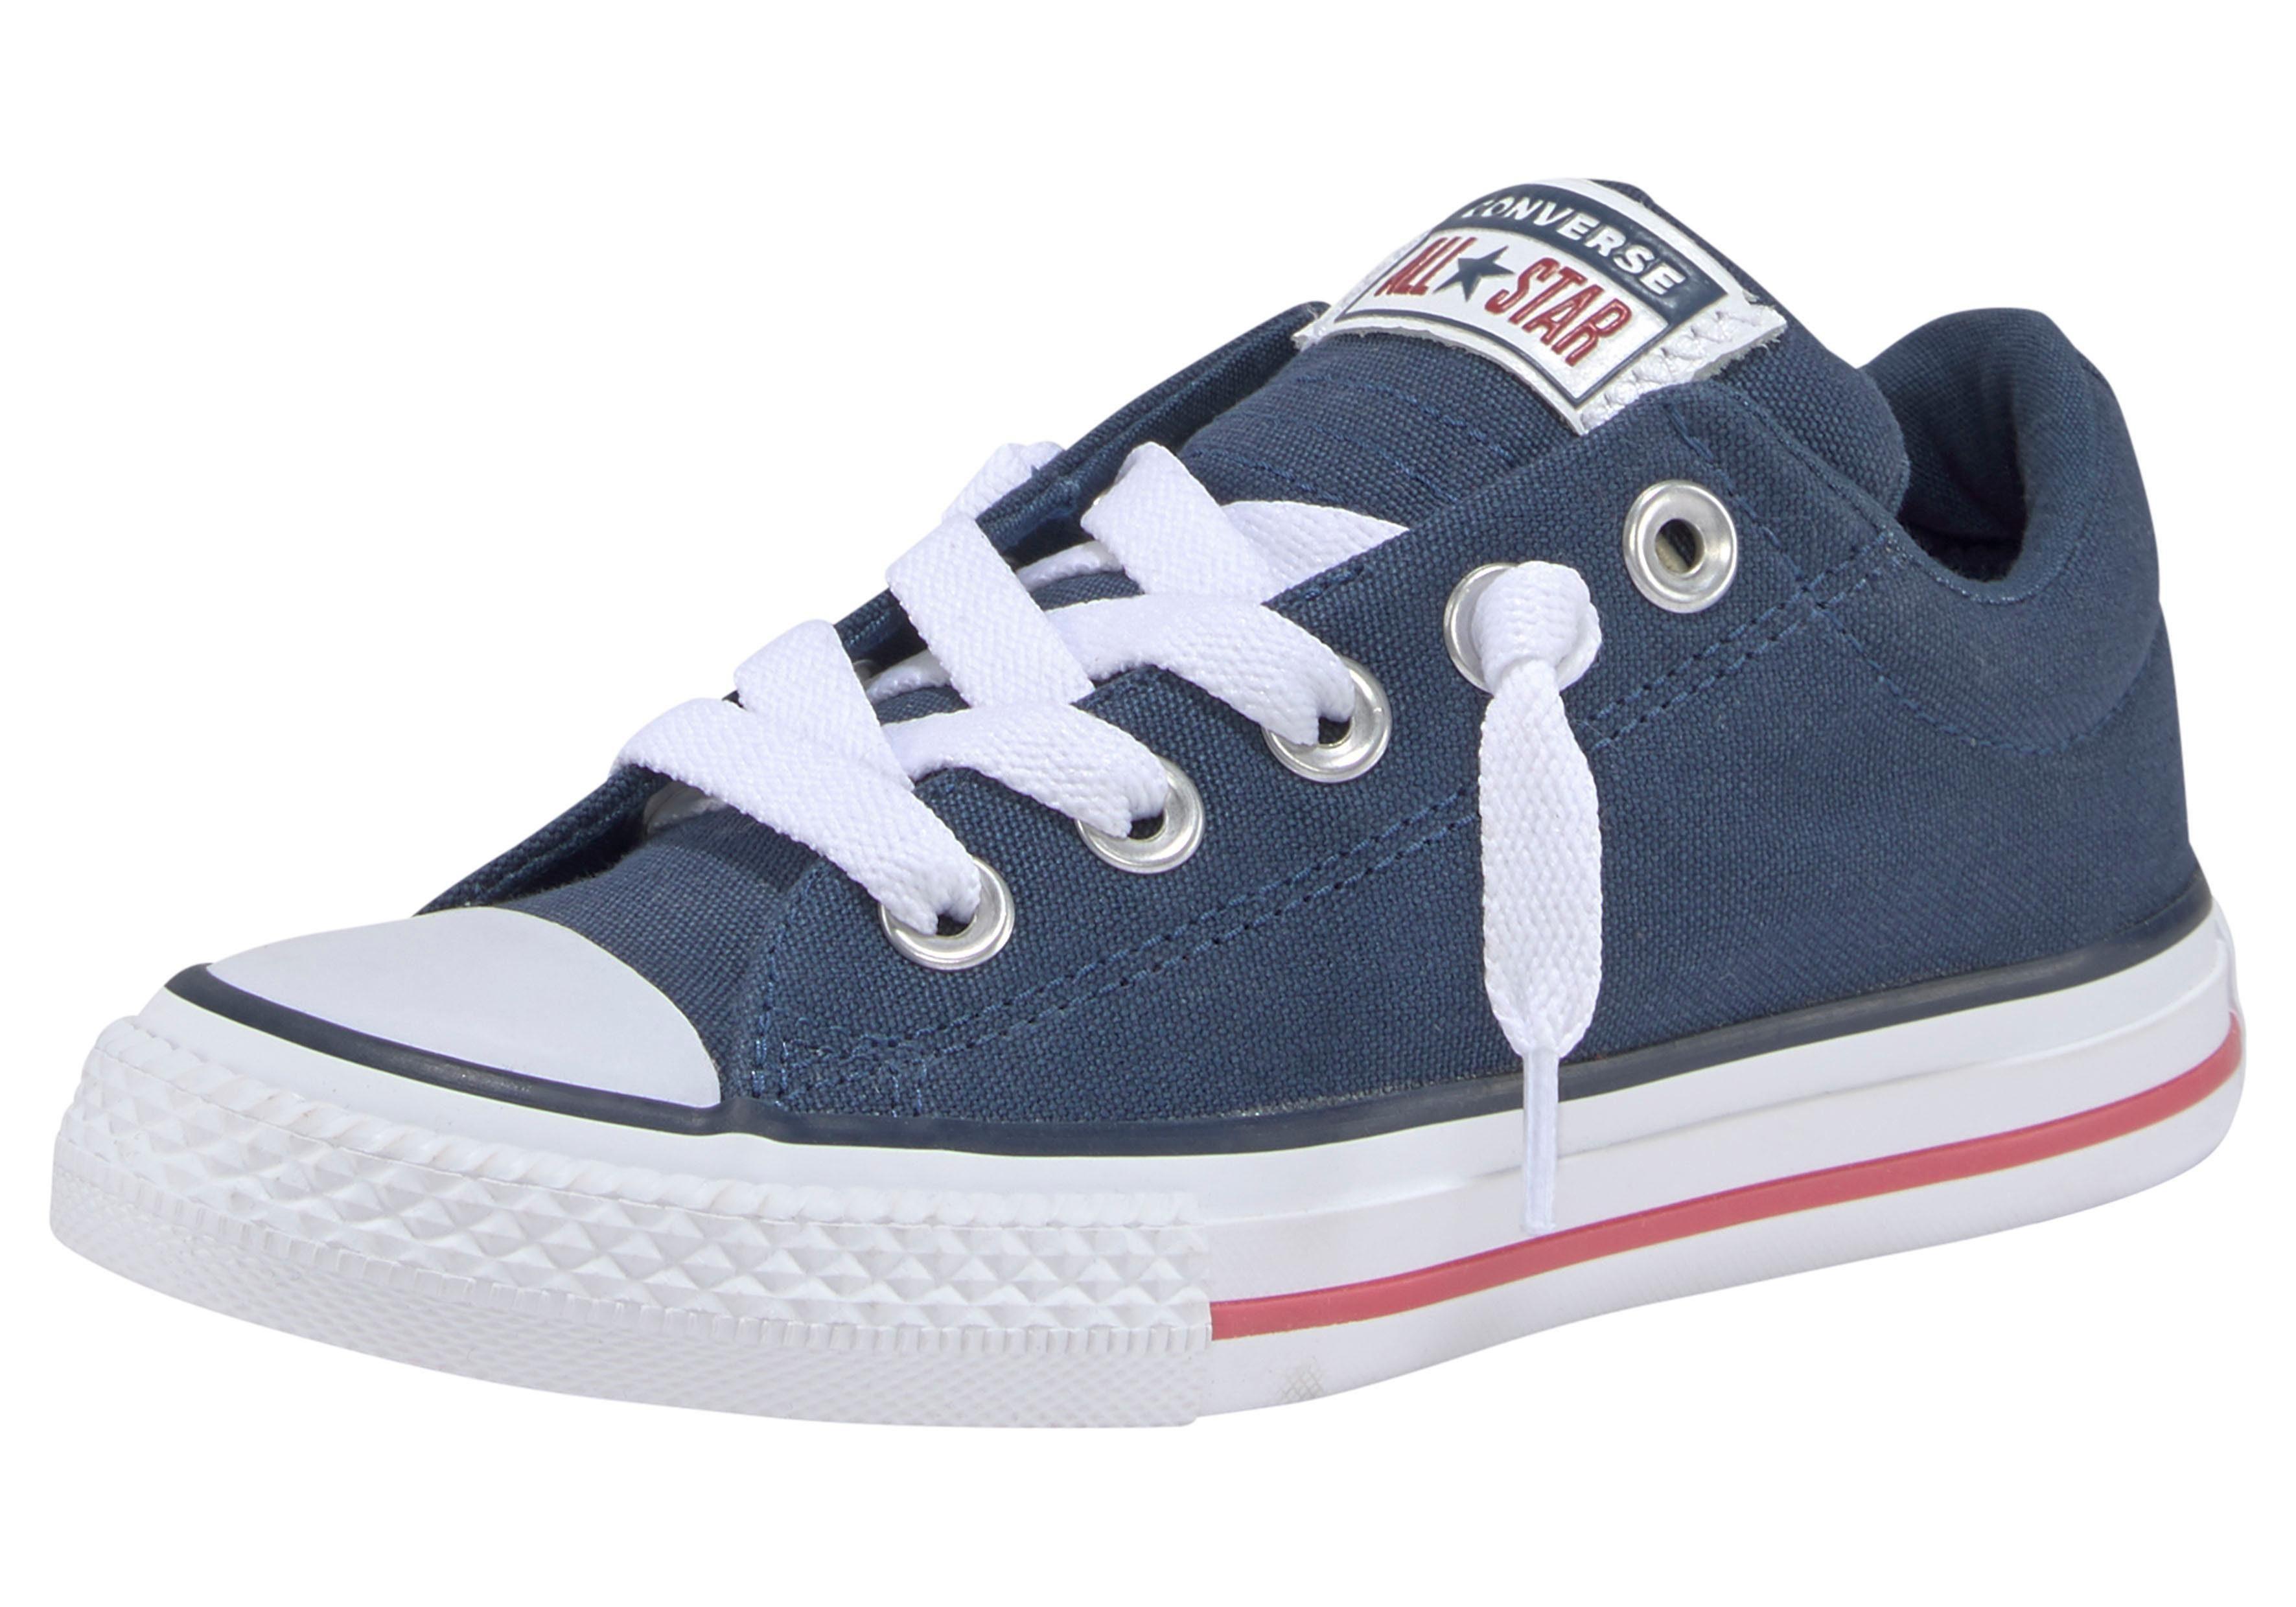 Converse »CHUCK TAYLOR ALL STAR STREET SLIP« Sneaker online kaufen   OTTO